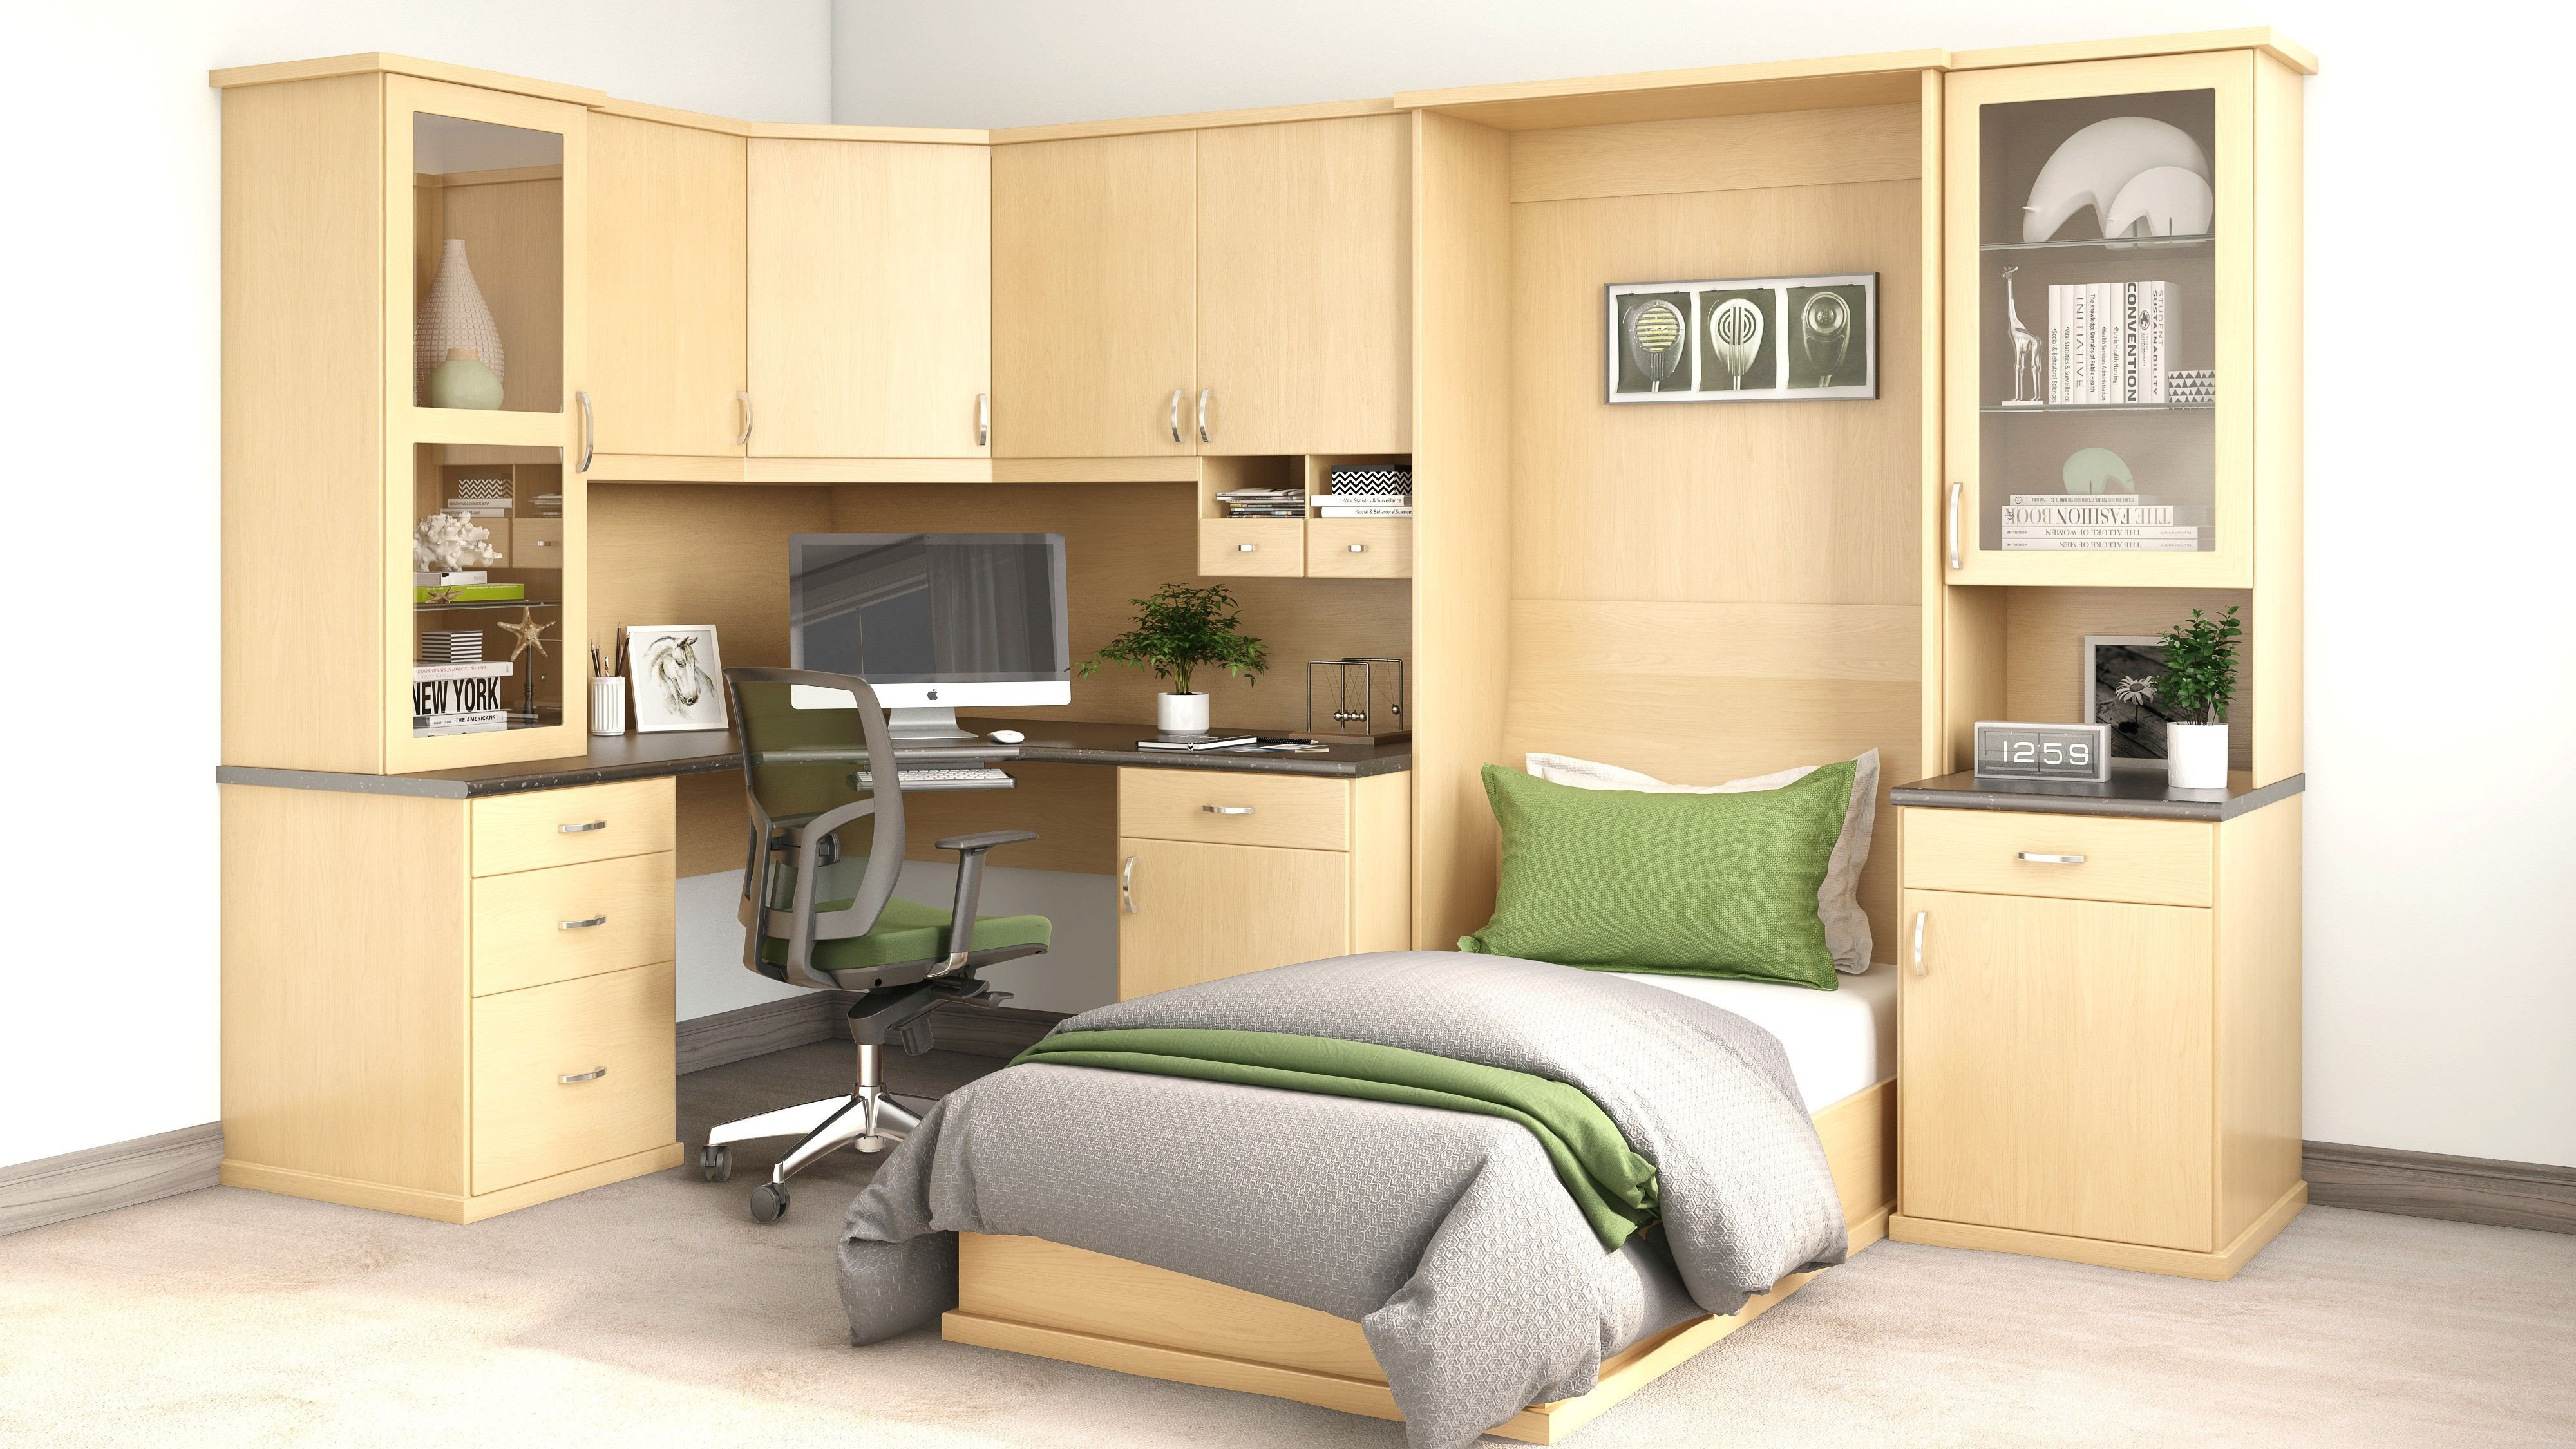 Wall Units Bedroom Furniture Beautiful Closet World Bedtec™ Wall Beds